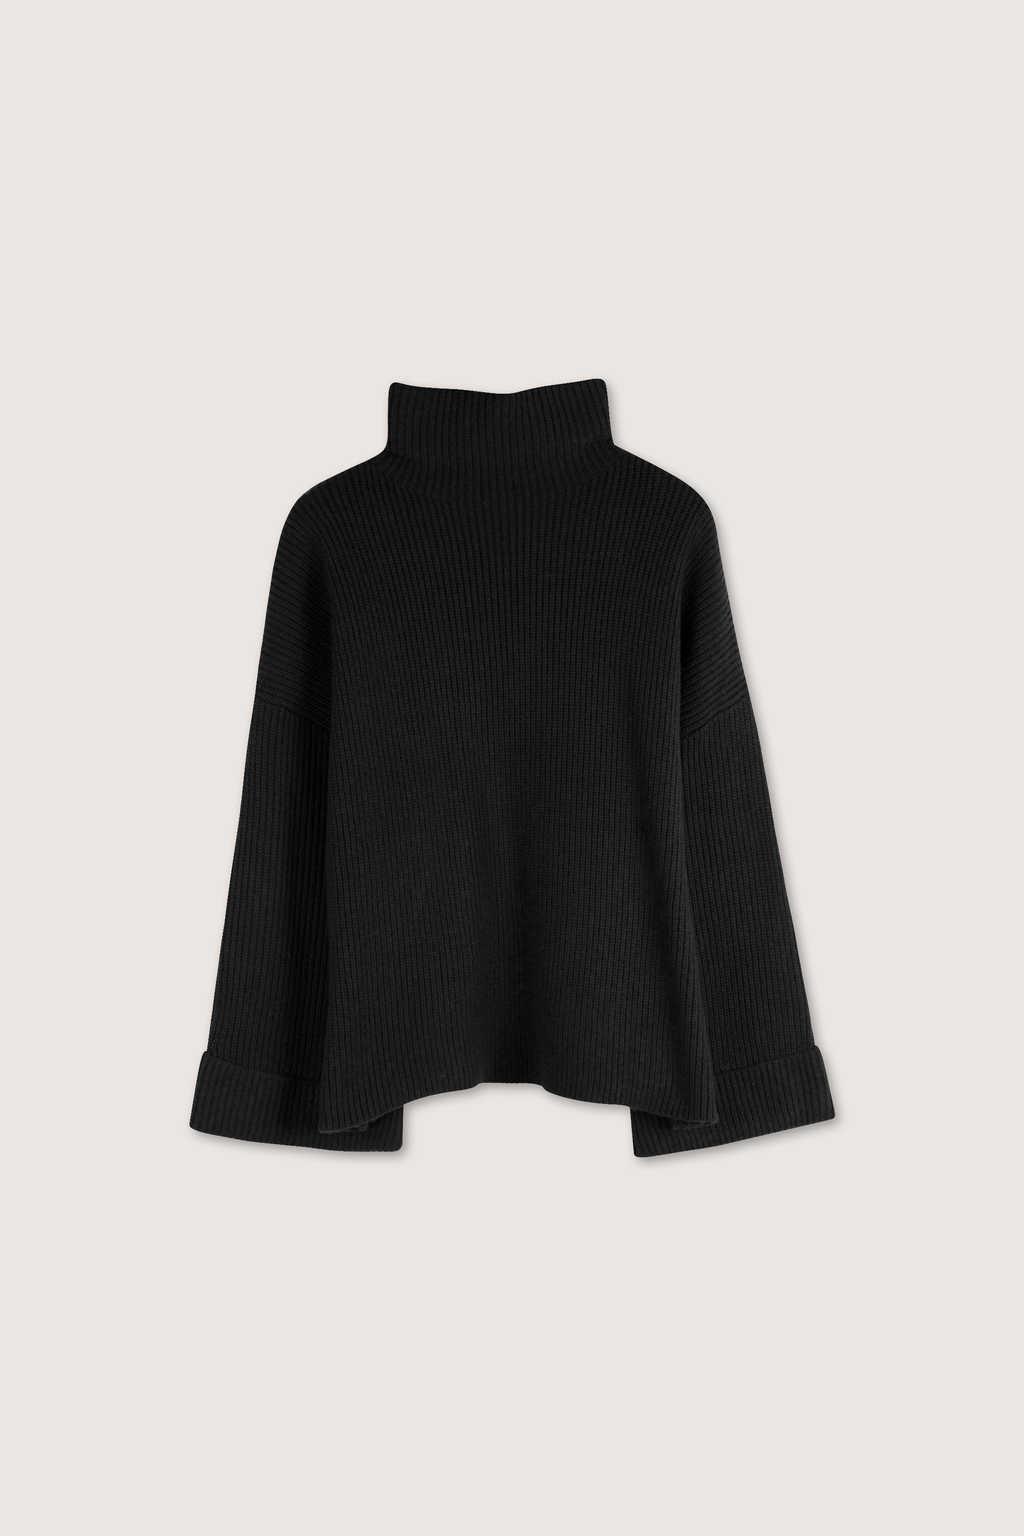 Sweater 1828 Black 9